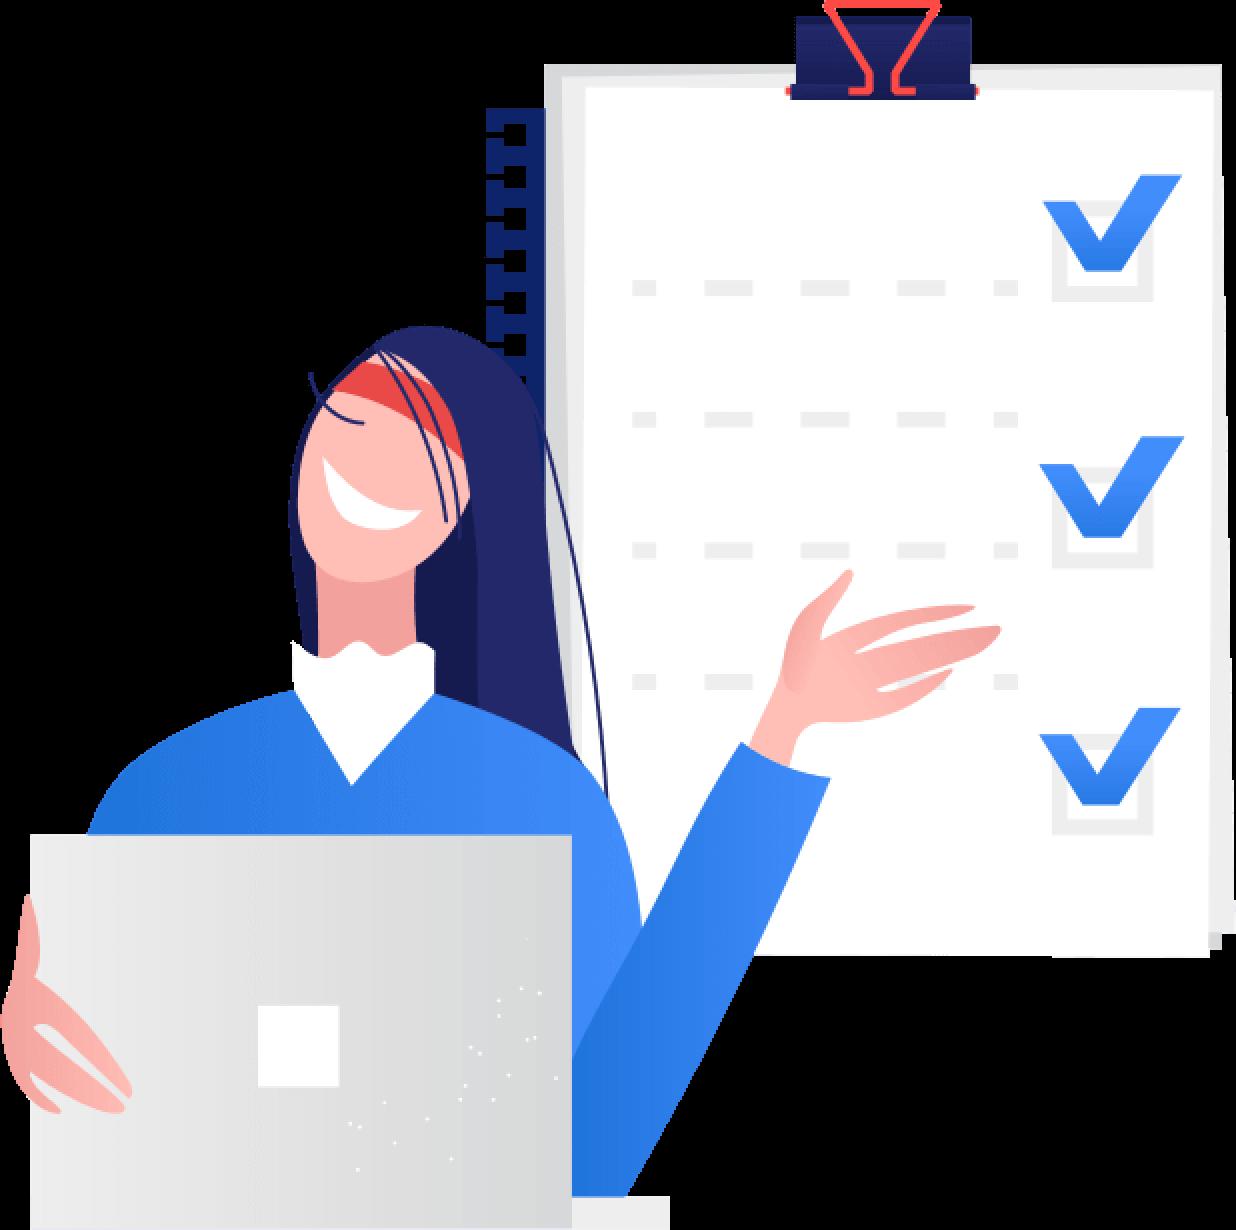 2021-ux-takvimi-userspots-user-experience-design-junuary-ocak